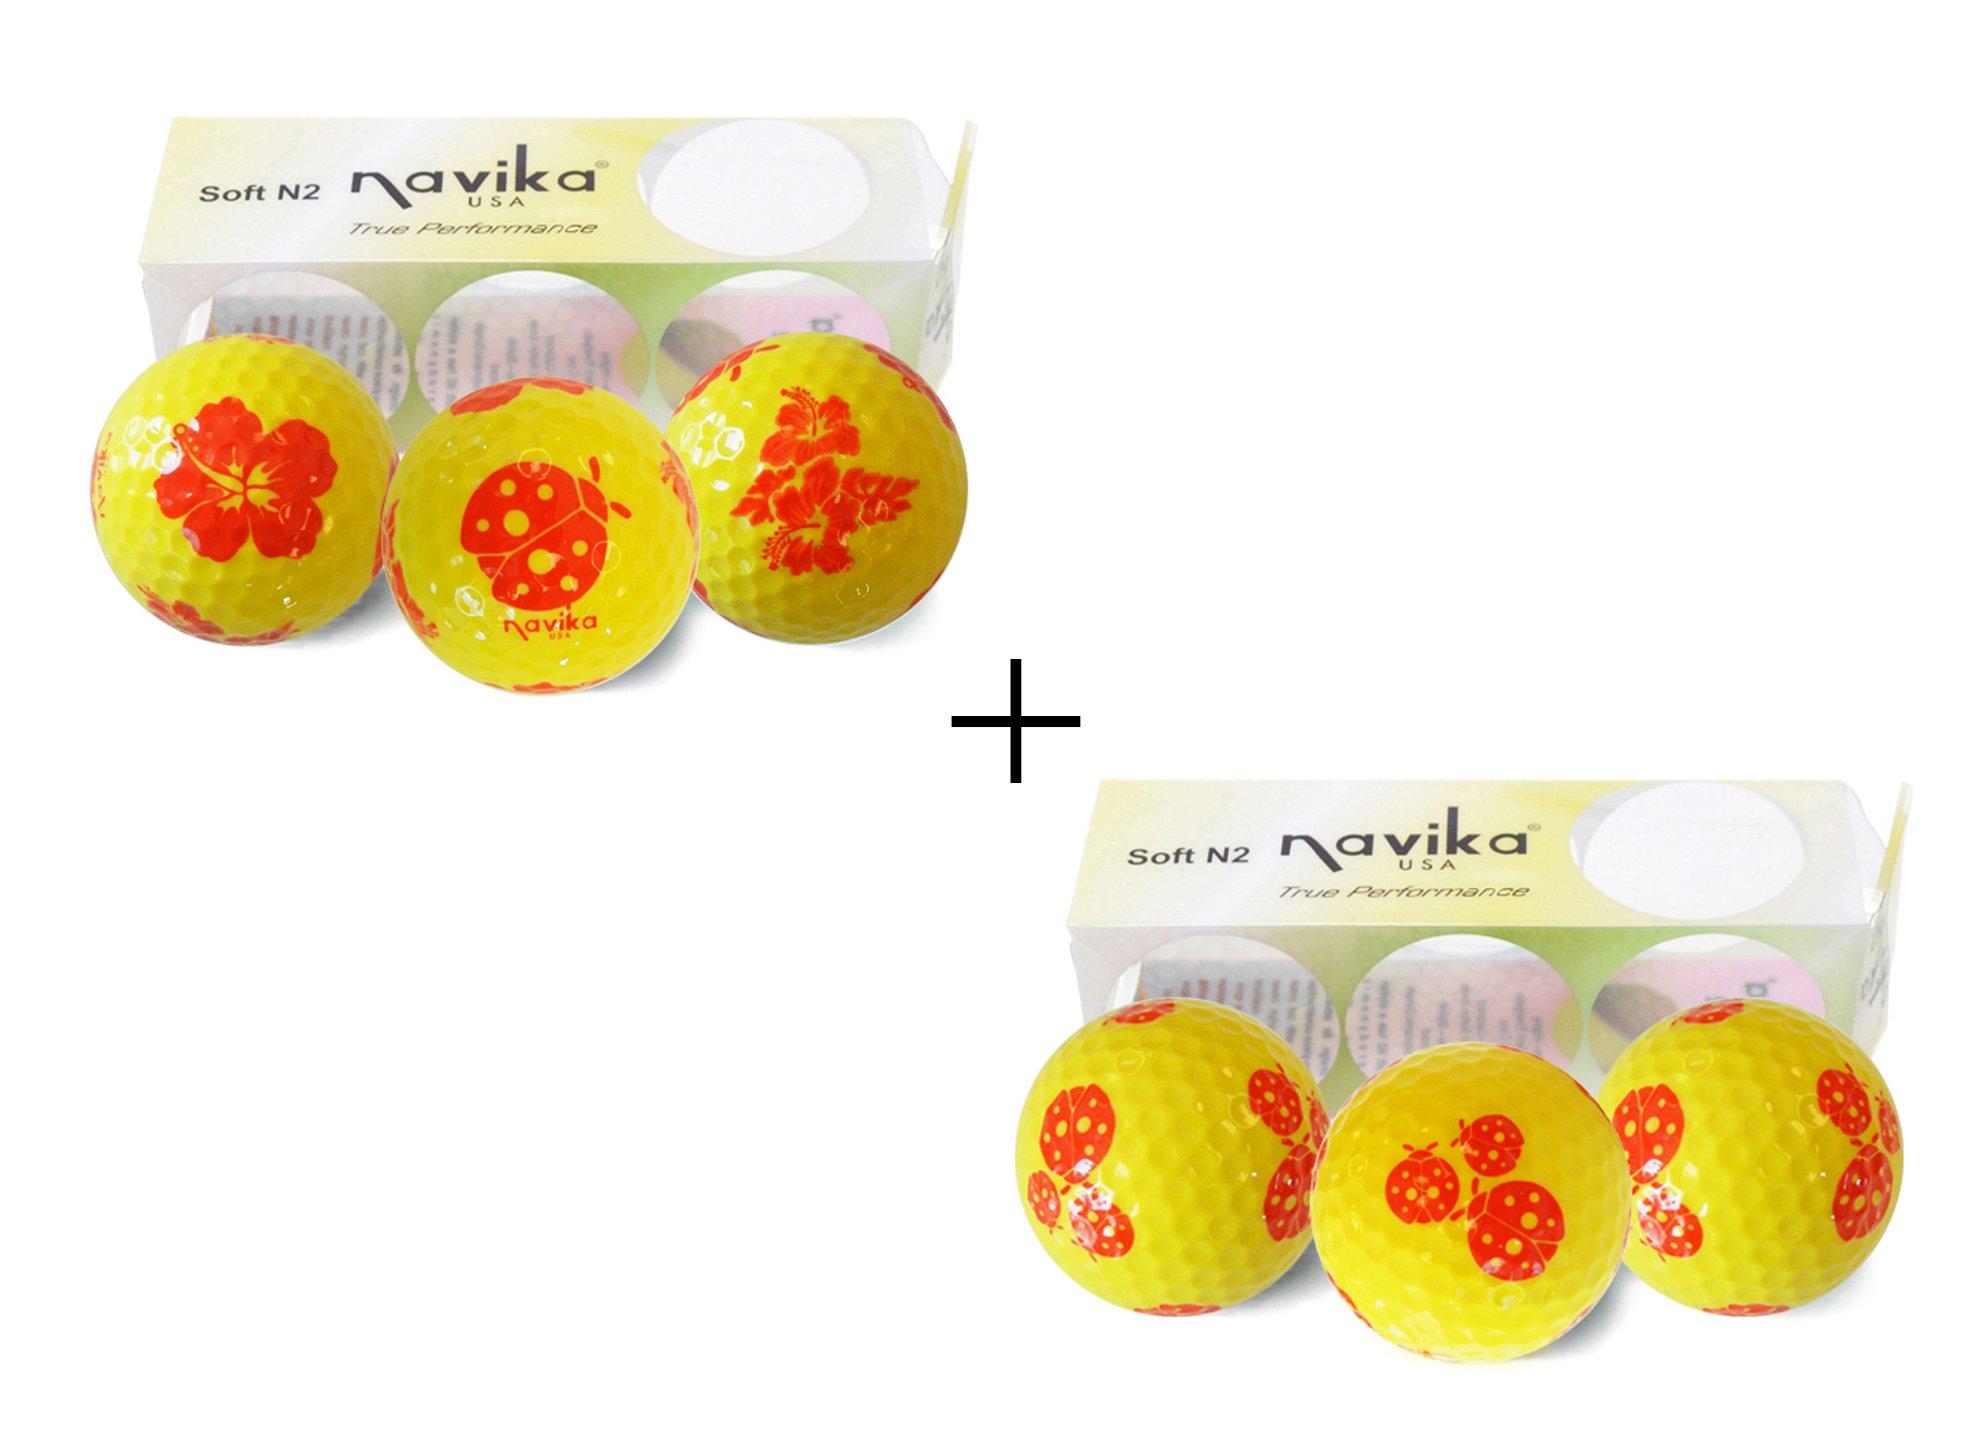 Navika GOLF BALLS- Ladybug/hibiscus Imprinted COMBO (2 PACK)